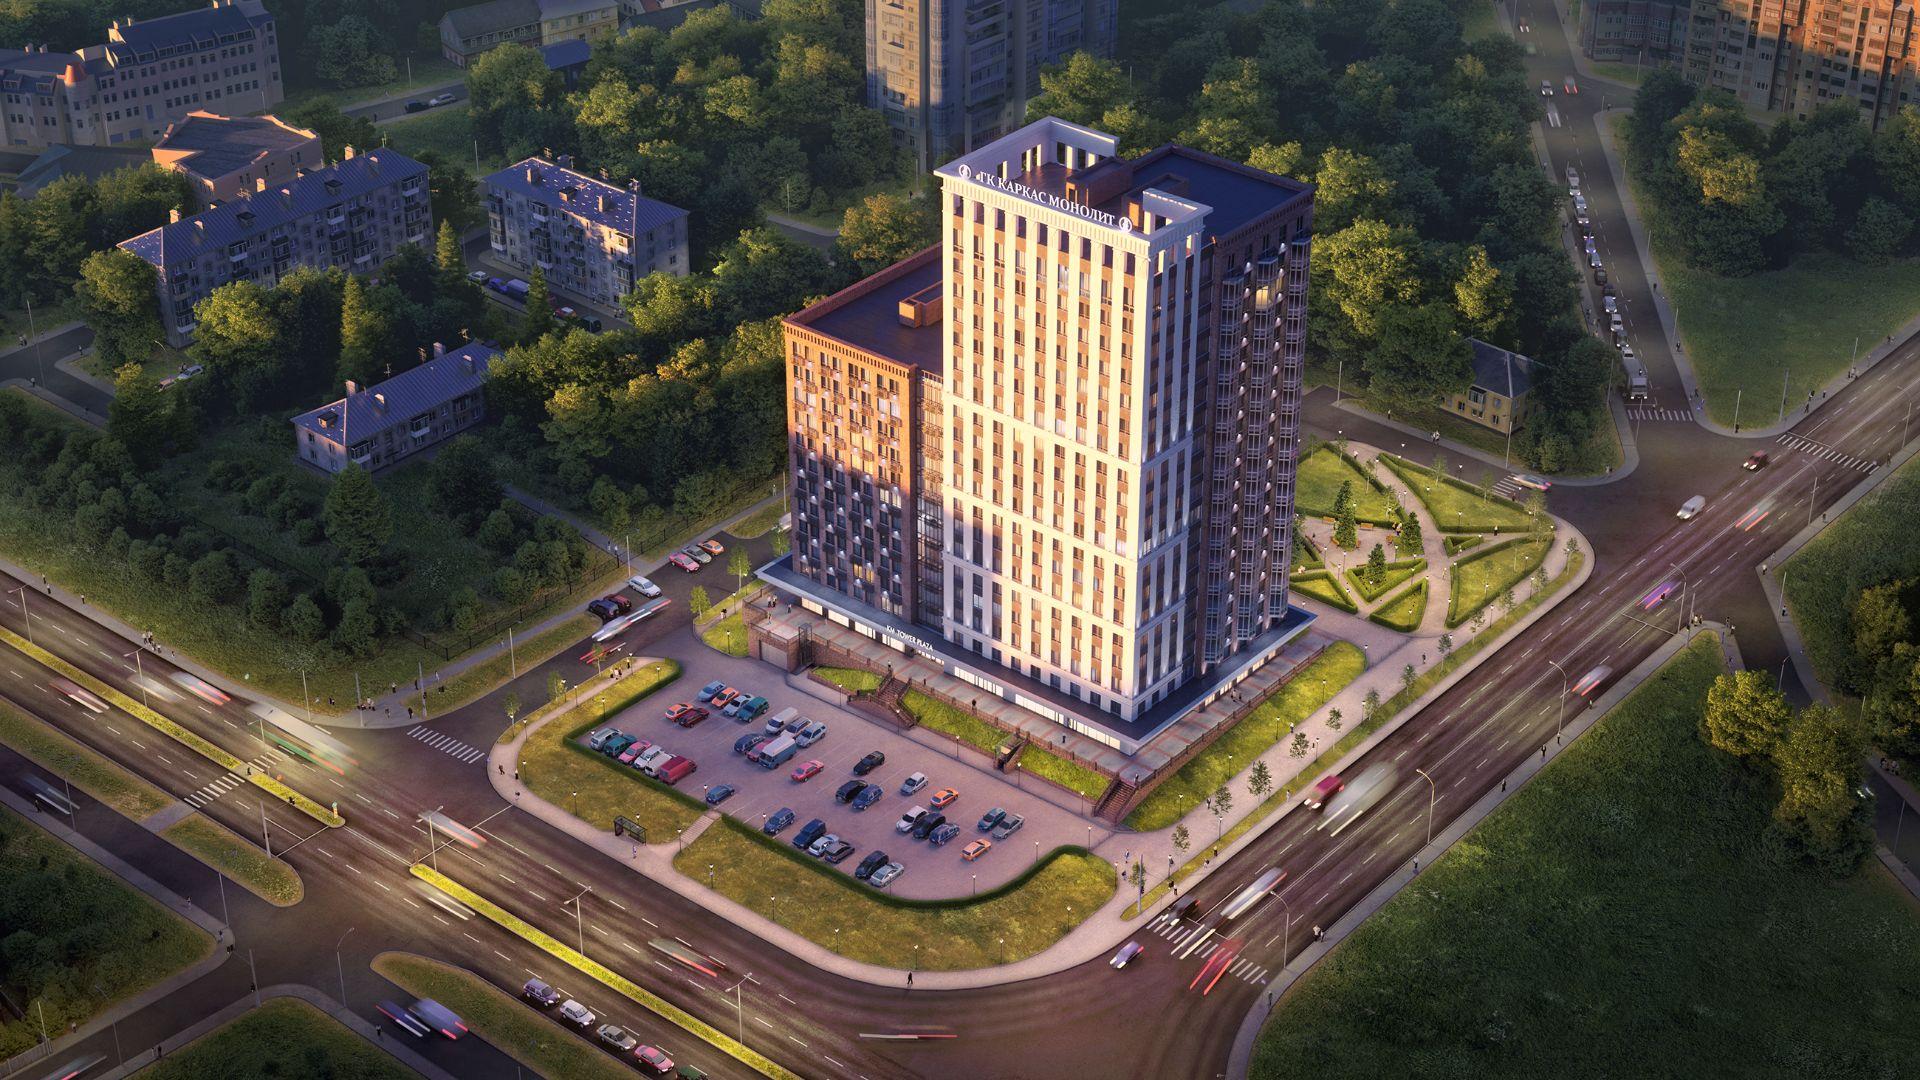 купить квартиру в ЖК Апарт-комплекс KM Tower Plaza (Апарт-комплекс КМ Тауэр Плаза)